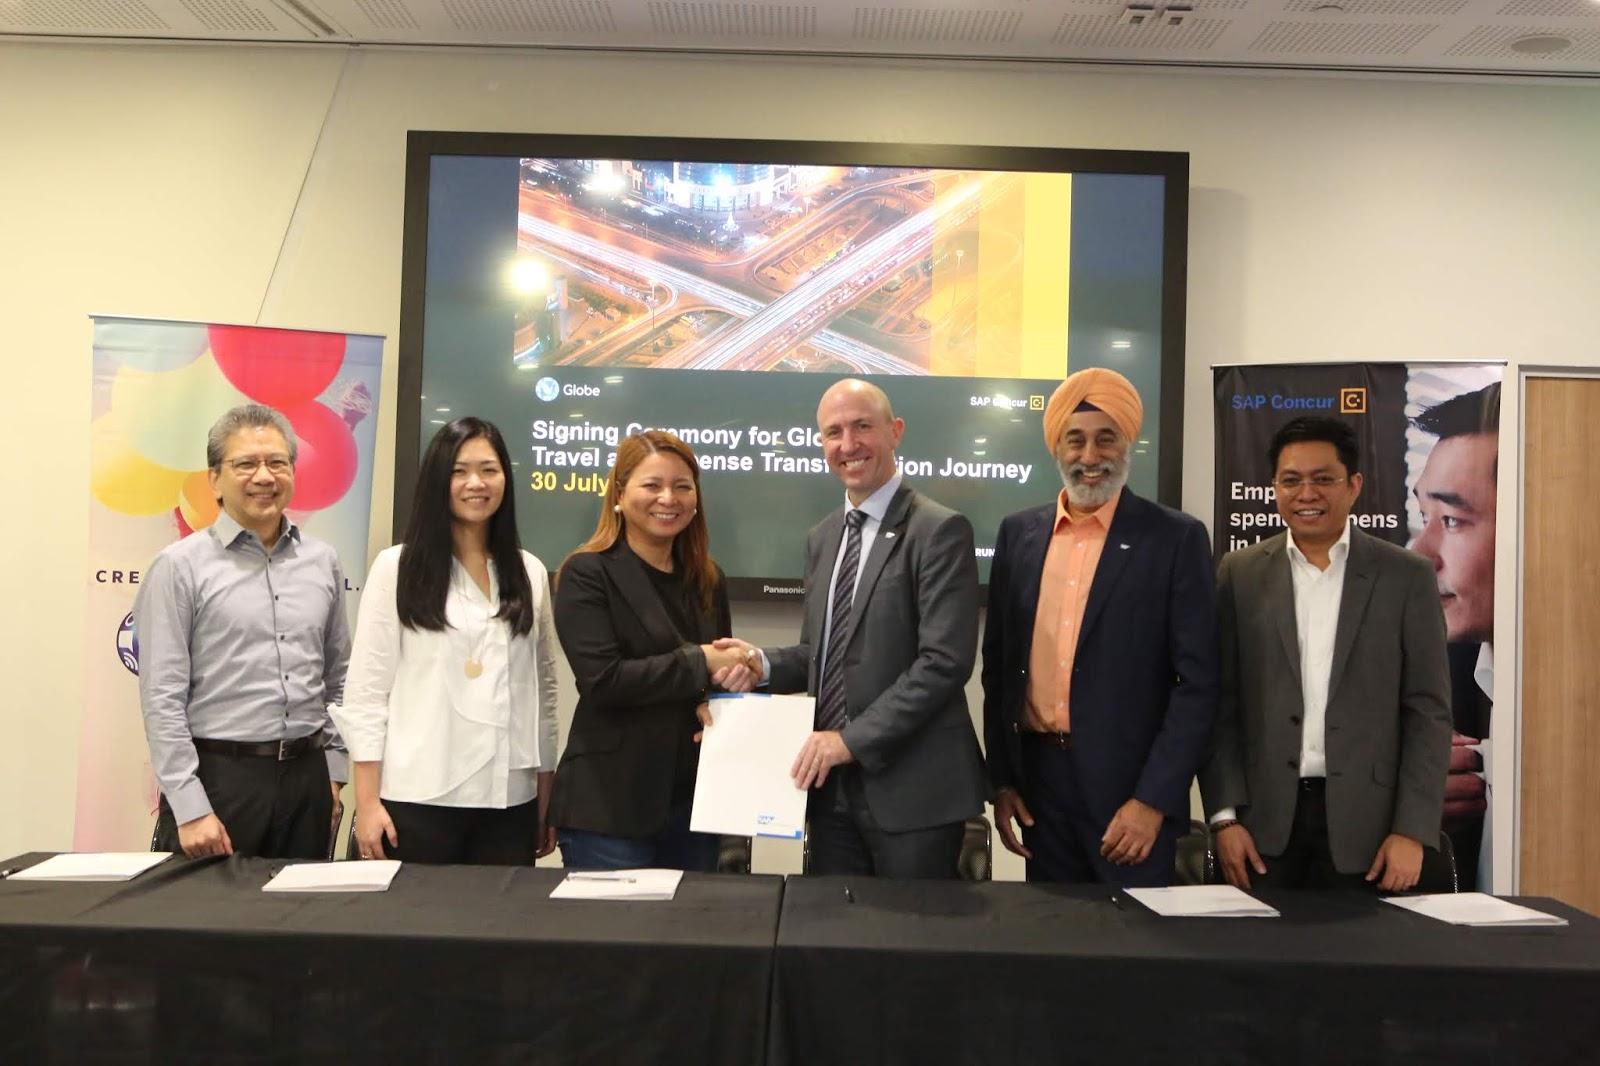 globe telecom signs partnership - HD5760×3840